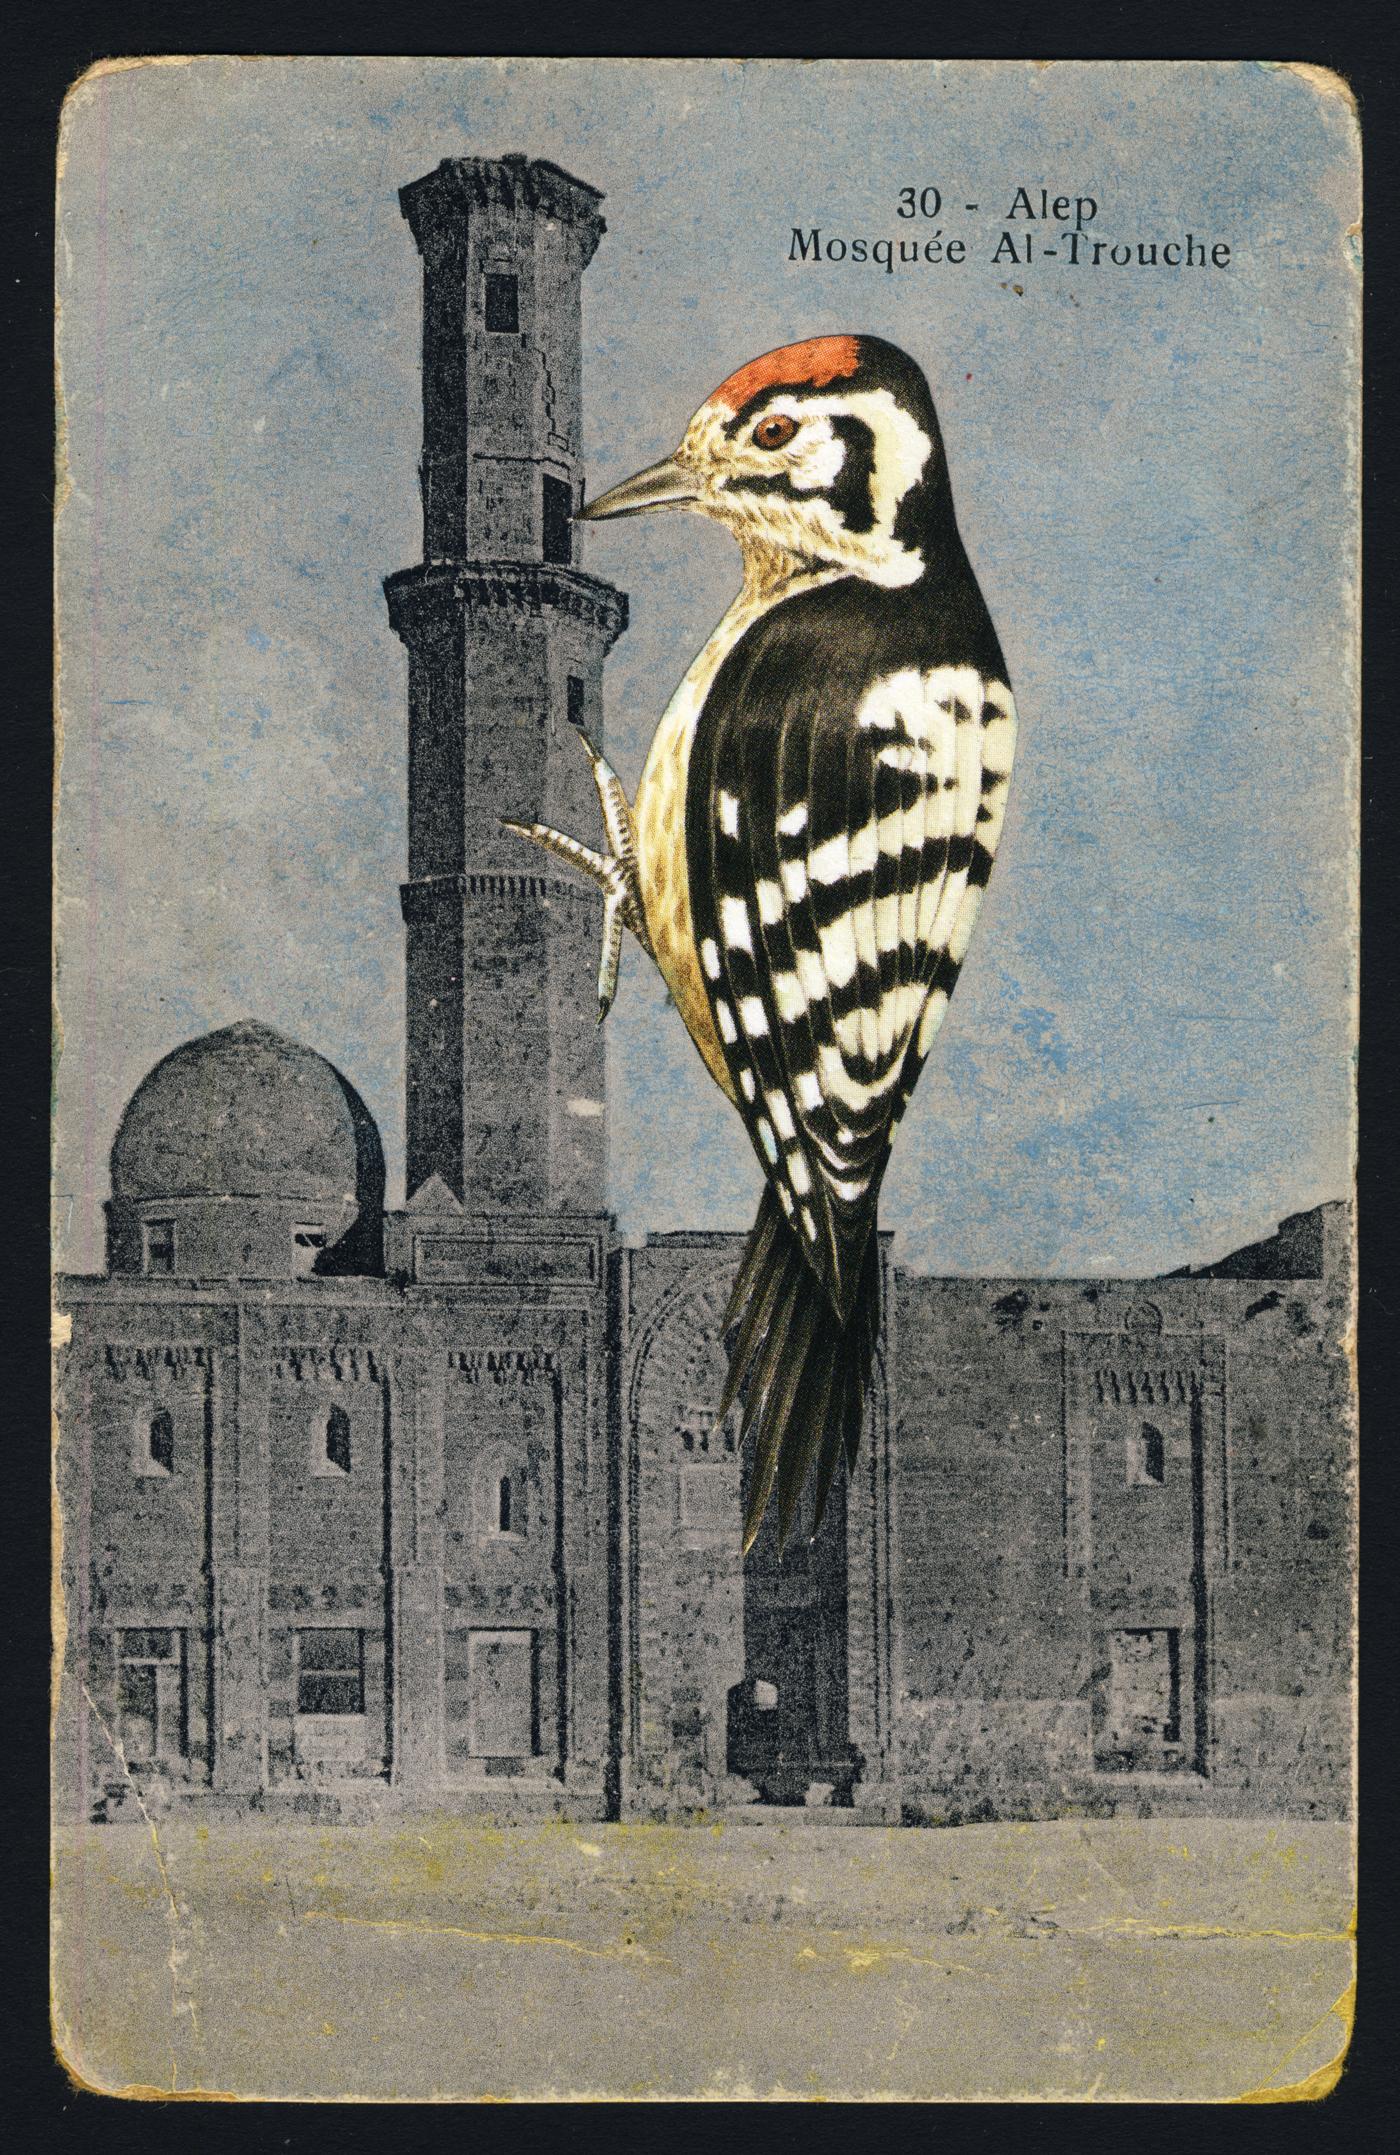 WOODPECKERTOWER 1 2019 Collage and Retouching fluid on vintage postcard 9x14cm KEELERTORNERO